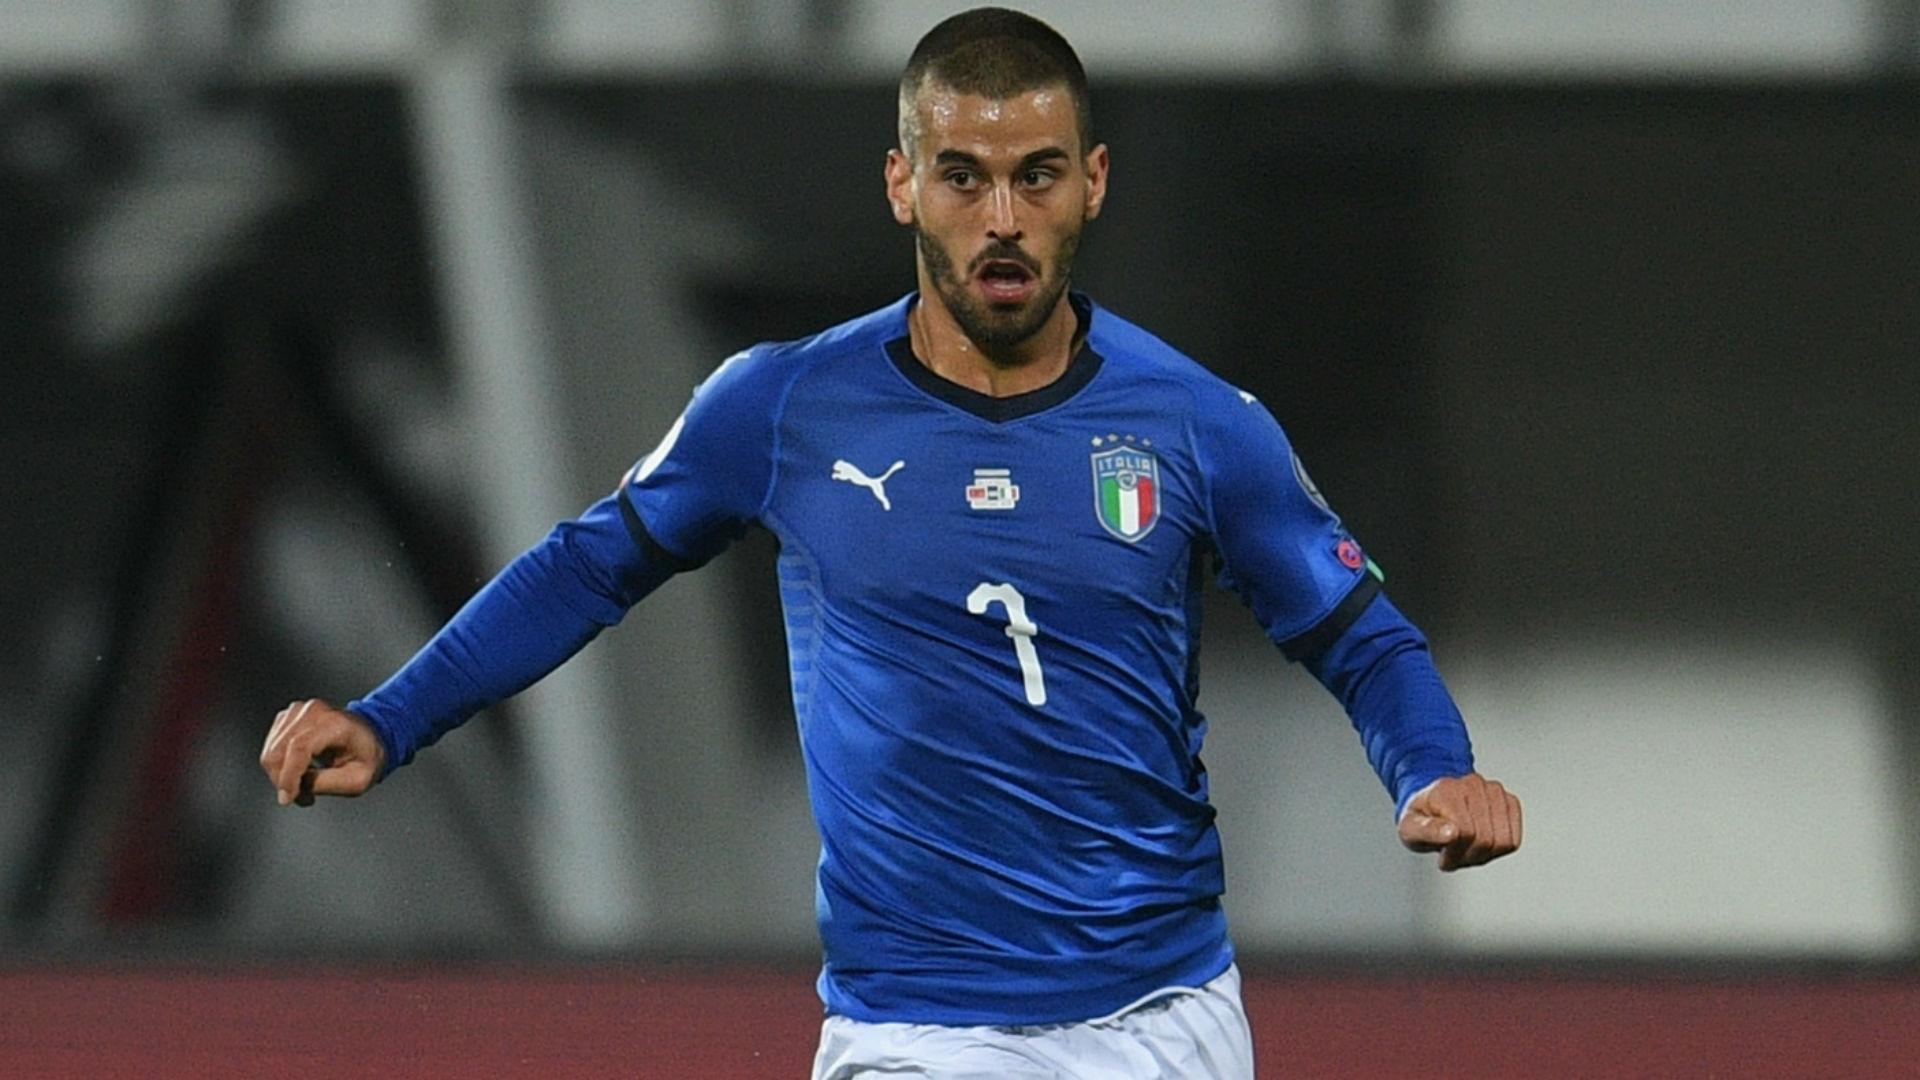 Playoff Mondiali 2018 Italia-Svezia, si fermano Spinazzola e Zaza